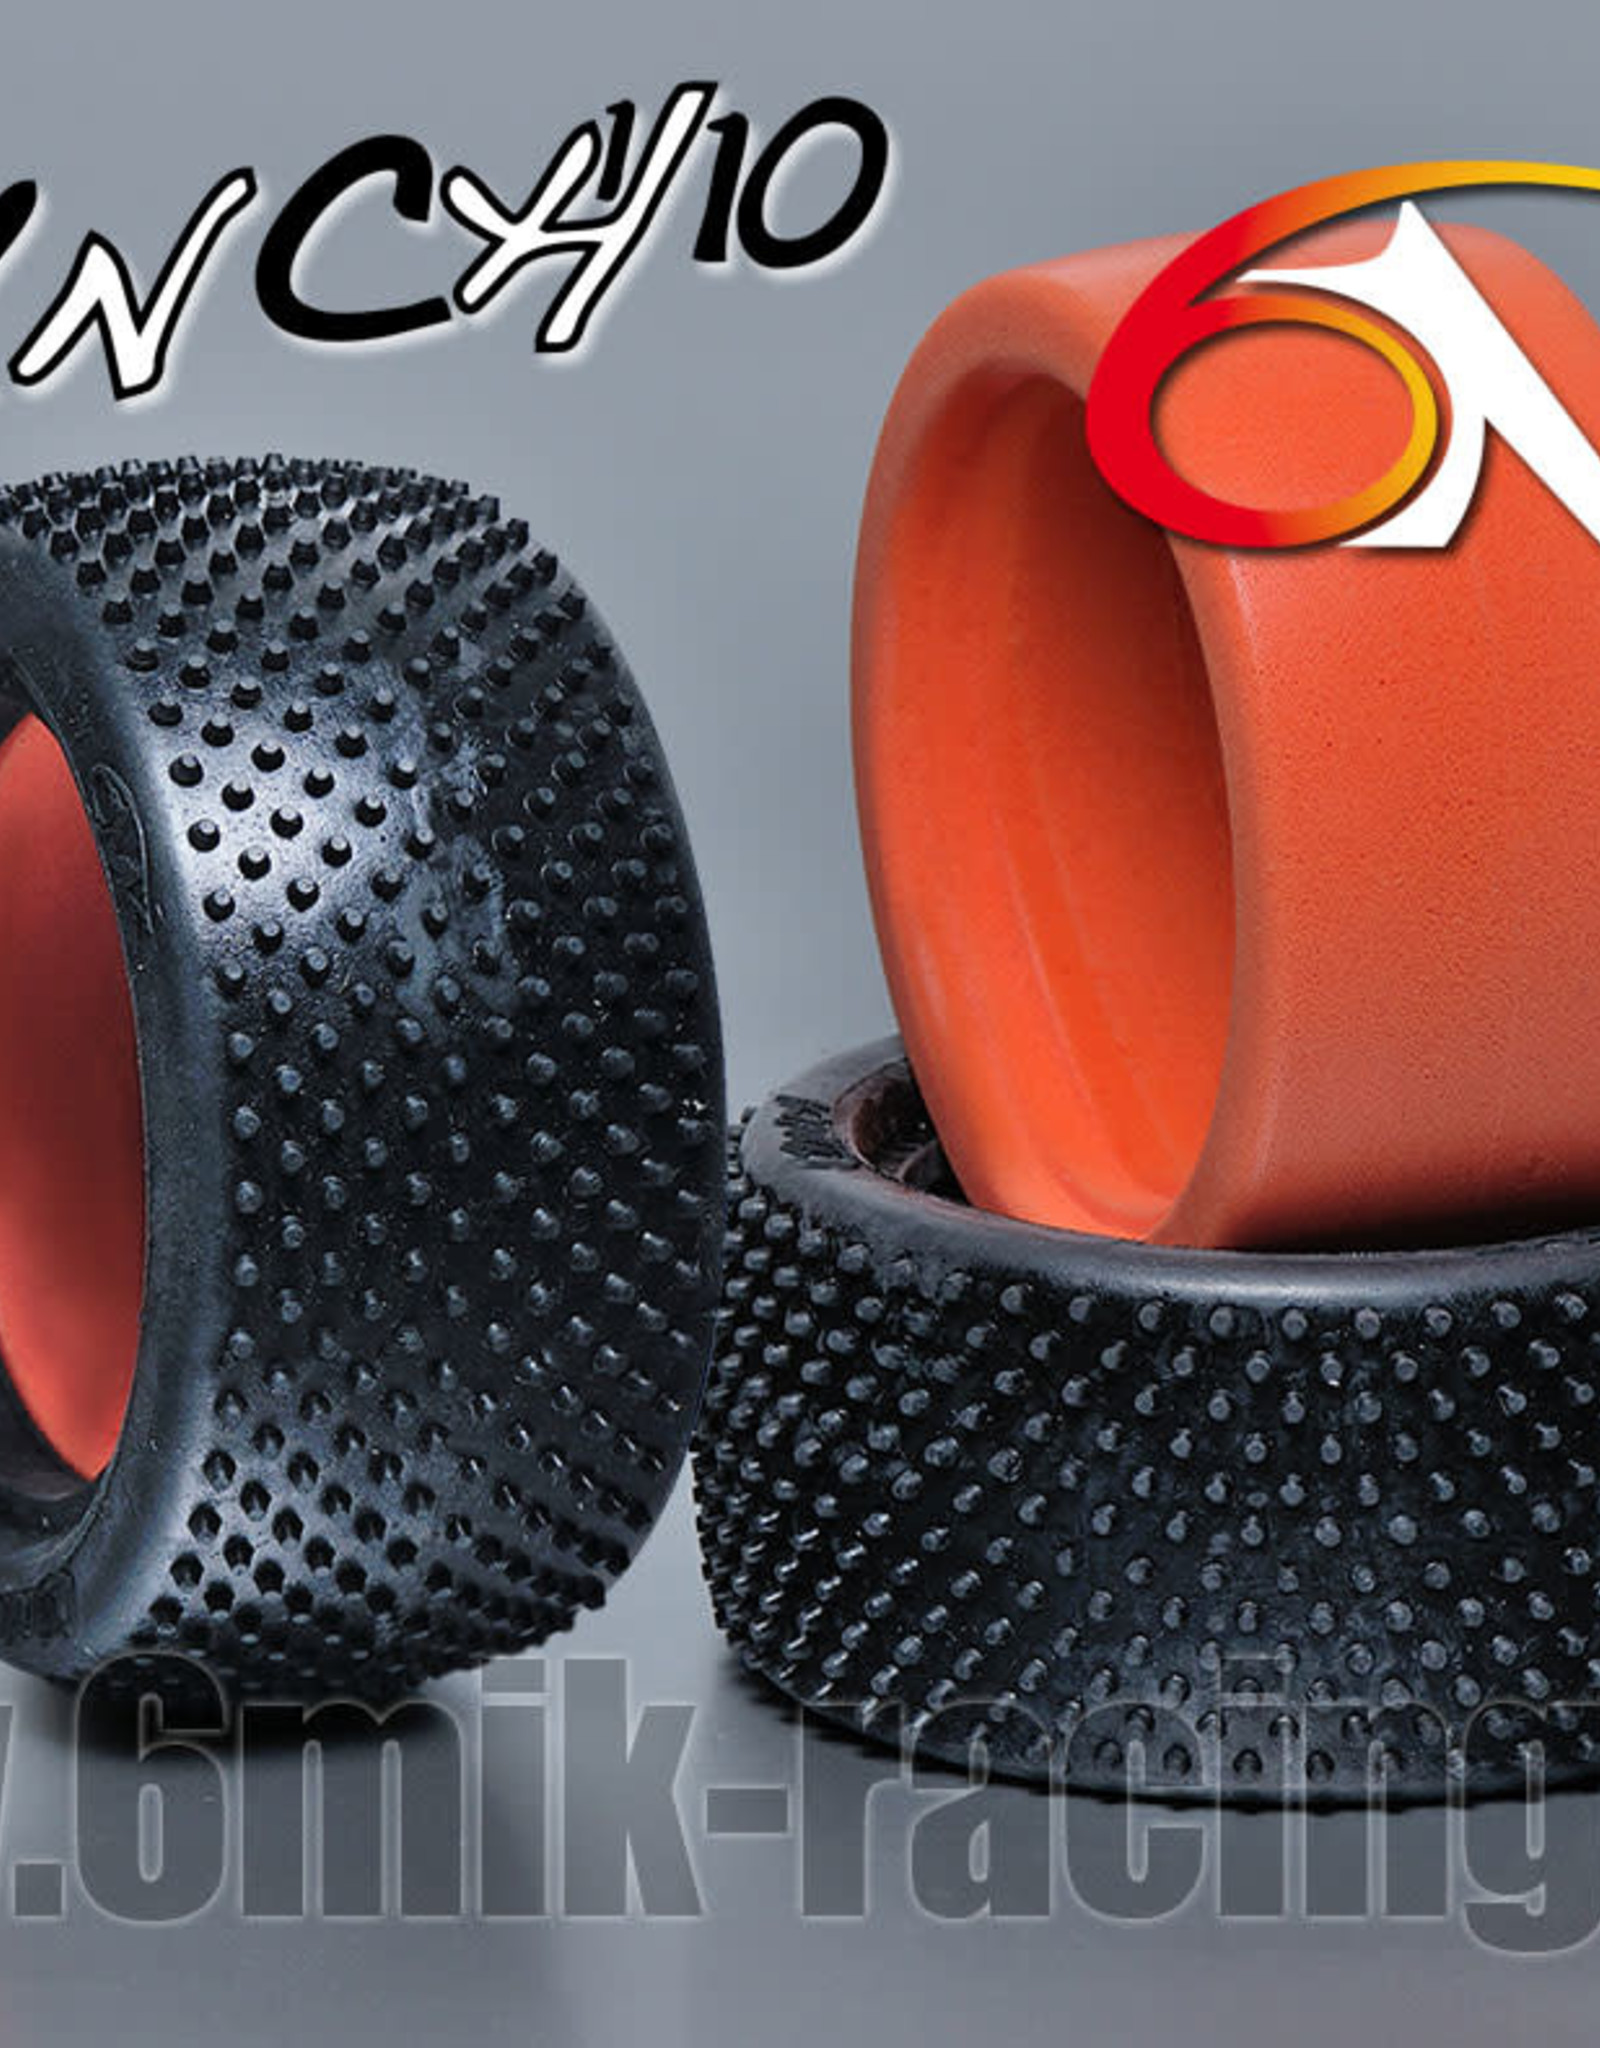 6MIK Crunch 2.2 1/10 Rear Buggy